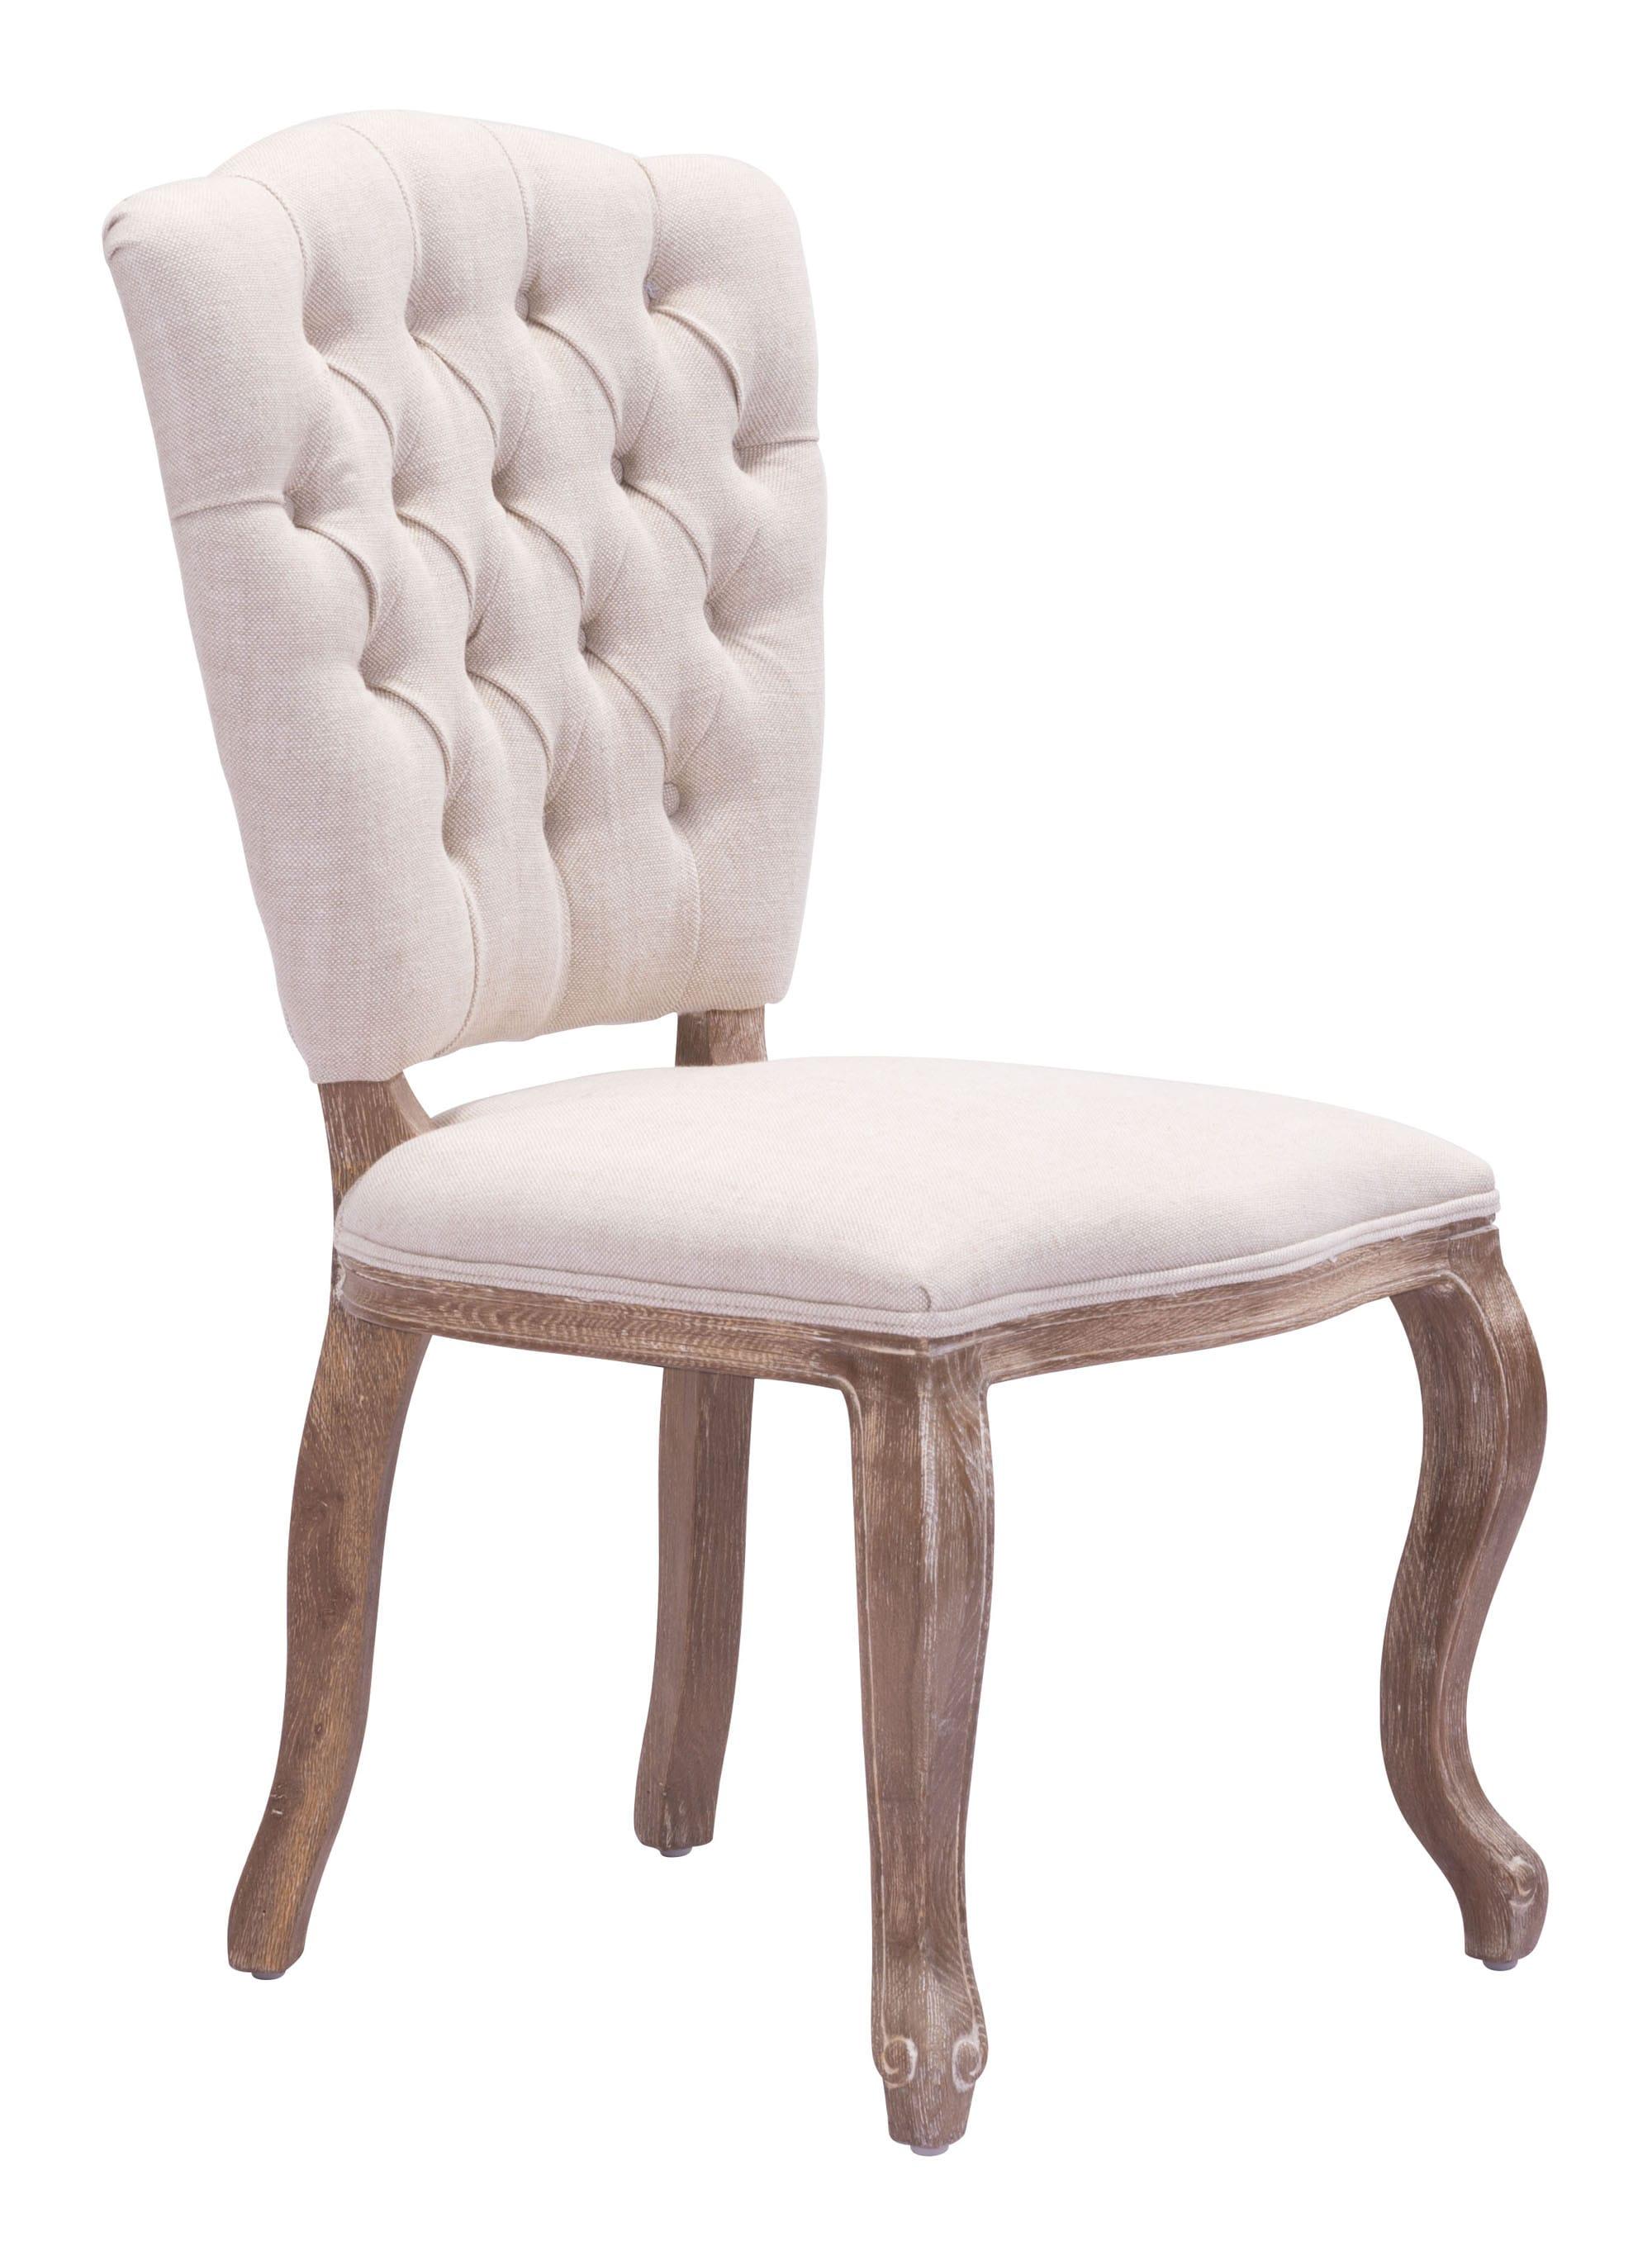 Eddy Dining Chair Beige Set Of 2 By Zuo Modern